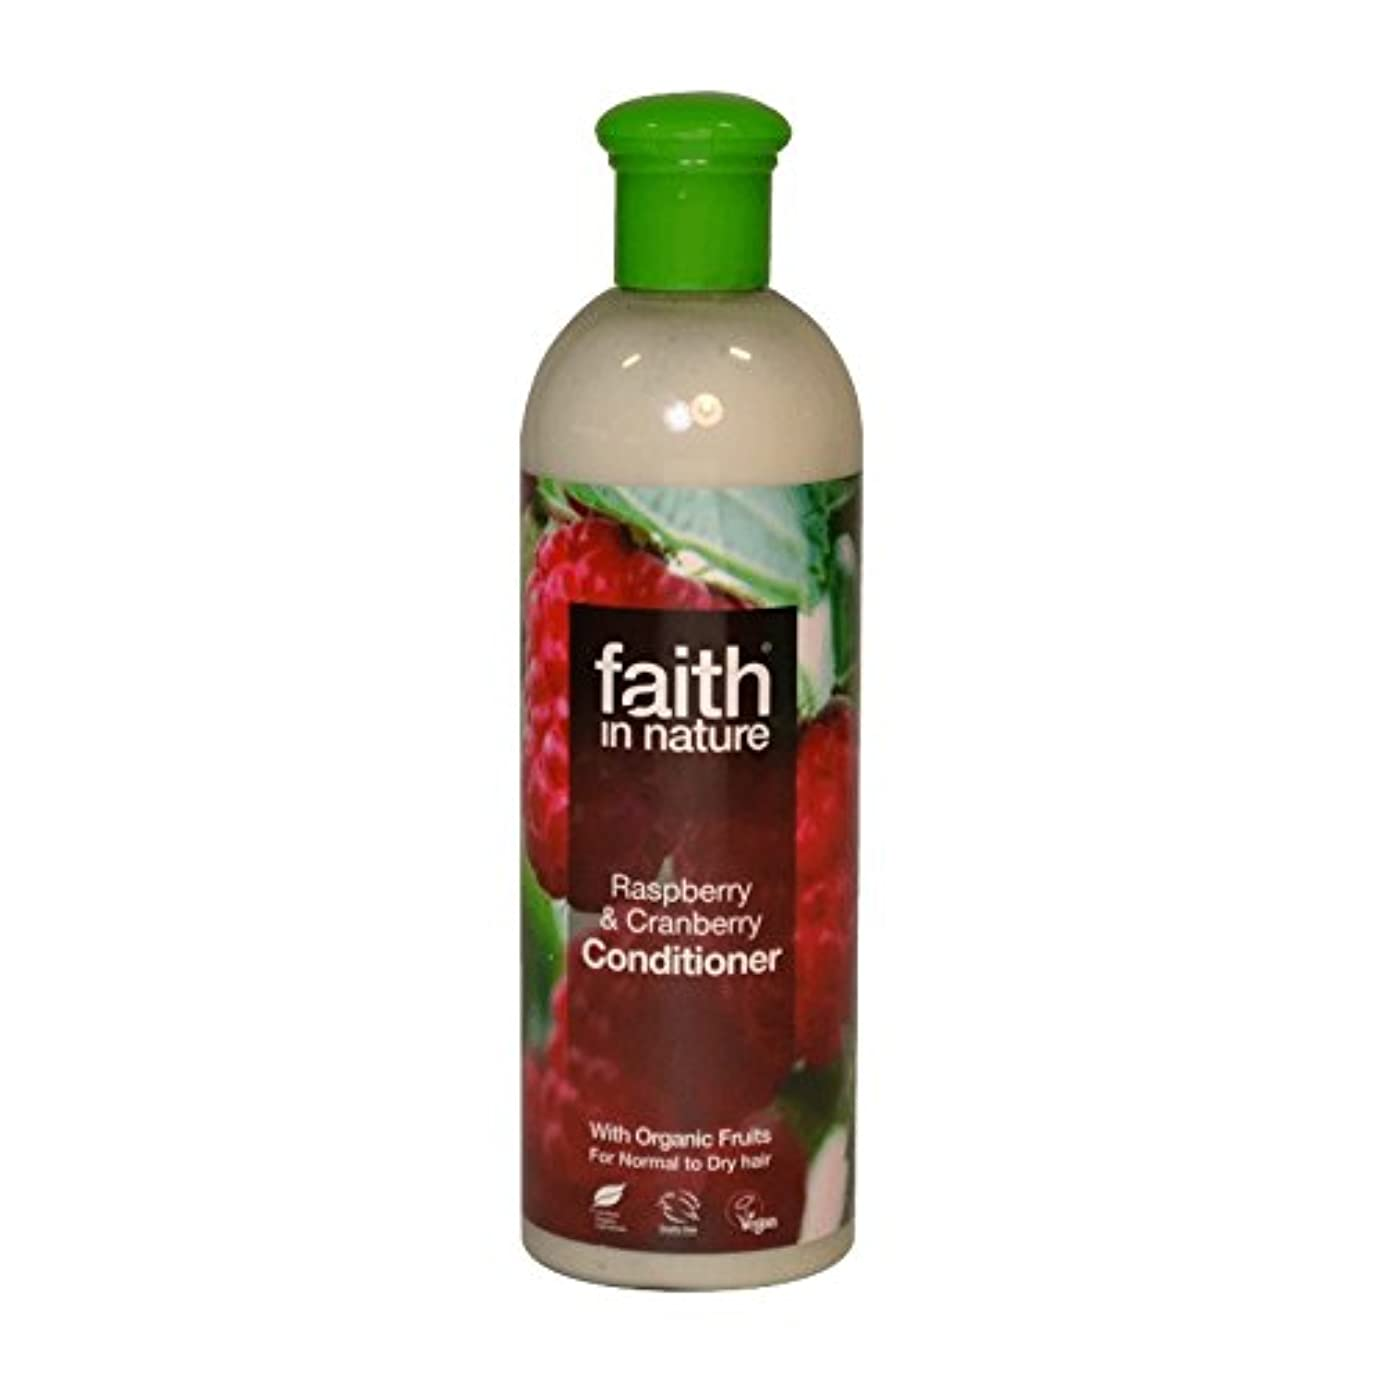 Faith in Nature Raspberry & Cranberry Conditioner 400ml (Pack of 2) - 自然ラズベリー&クランベリーコンディショナー400ミリリットルの信仰 (x2)...